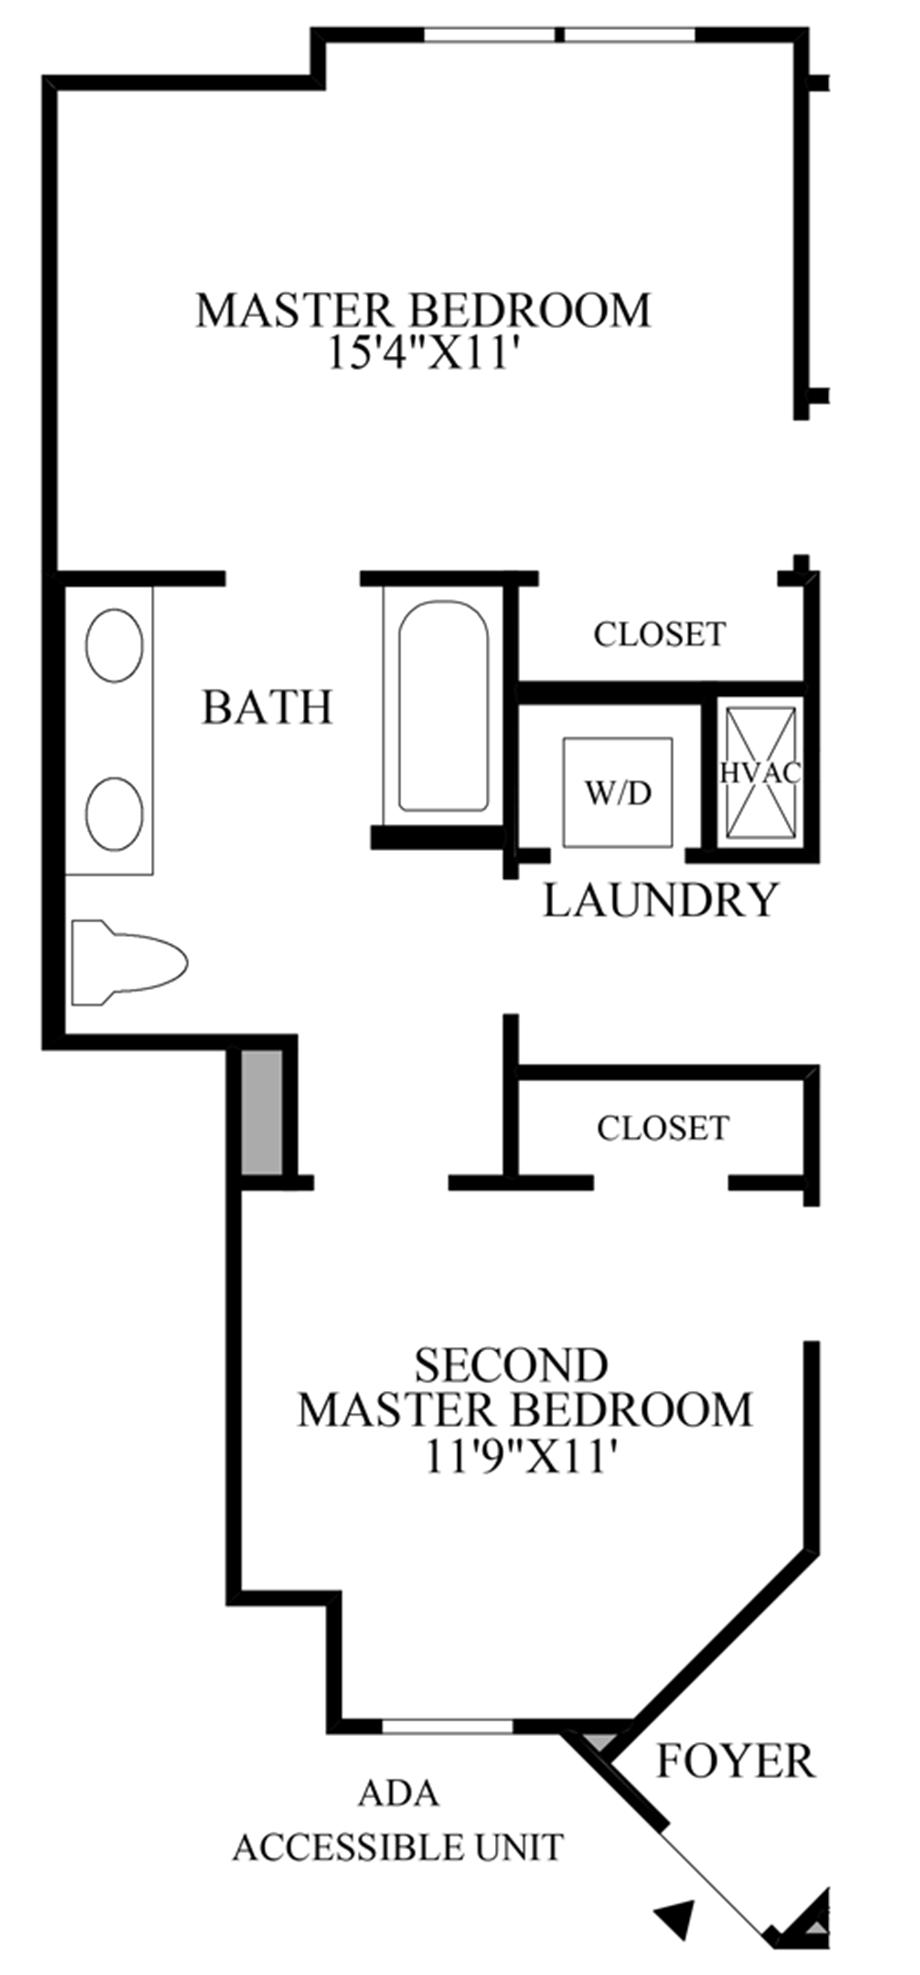 Ada Accessible Unit Floor Plan